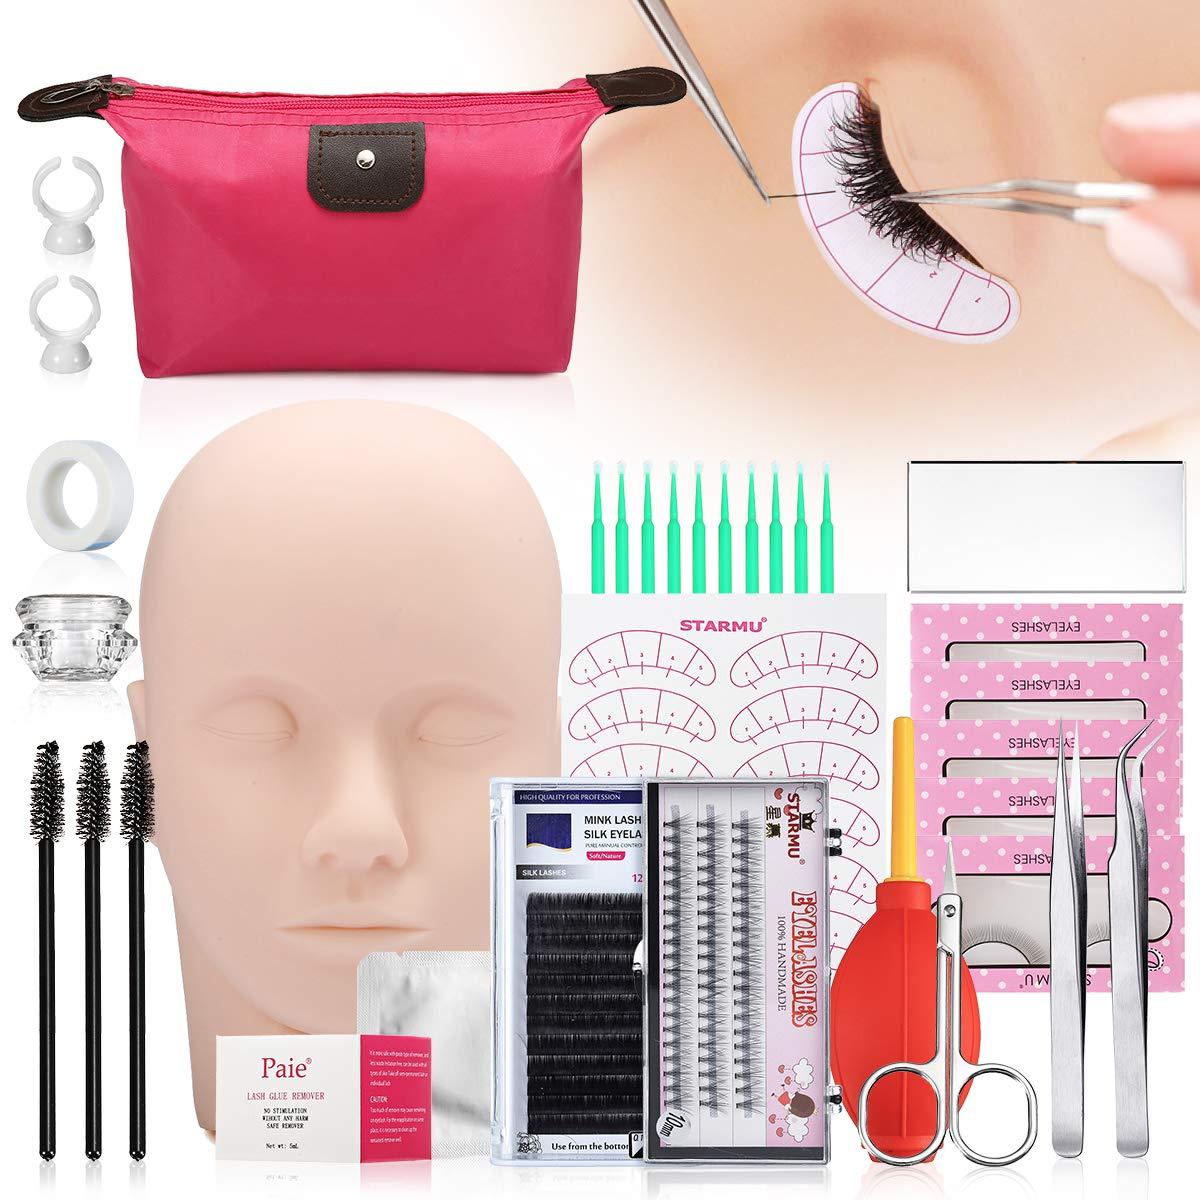 False Eyelashes Extension Practice Exercise Set, LuckyFine 17pcs Professional Head Model Lip Makeup Eyelash Grafting Training Tool Kit for Practice Eye Lashes Graft (Glue and Cleaner Not Include)